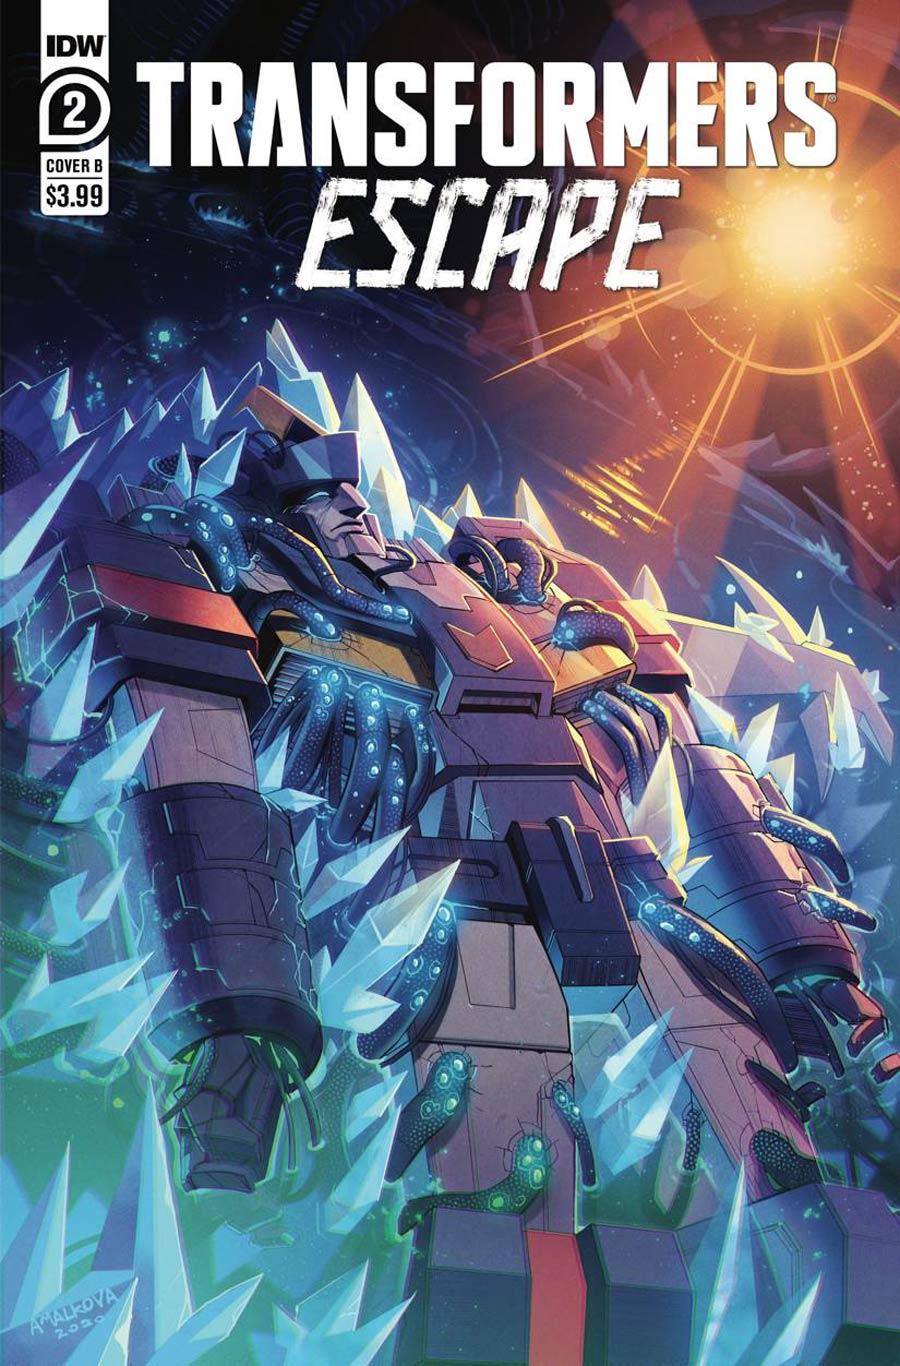 Transformers Escape #2 Cover B Variant Anna Malkova Cover